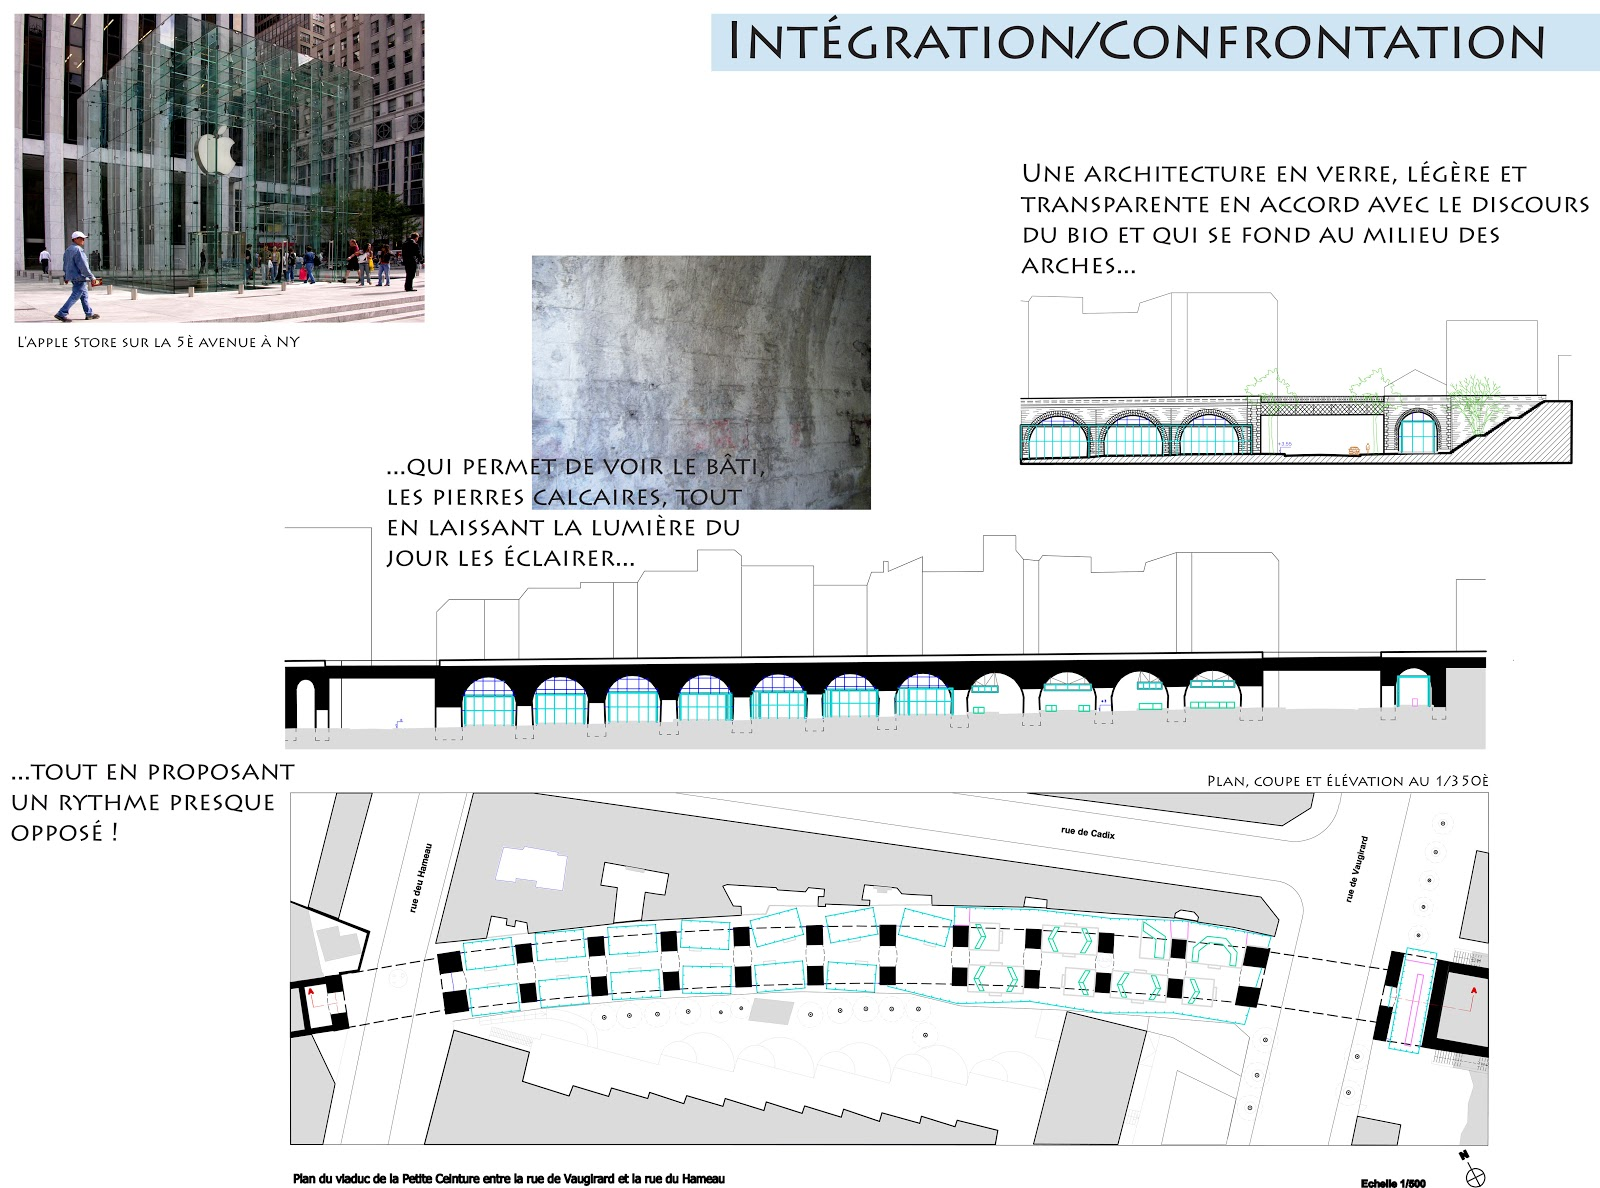 marine u0026 39 s portfolio  architecture